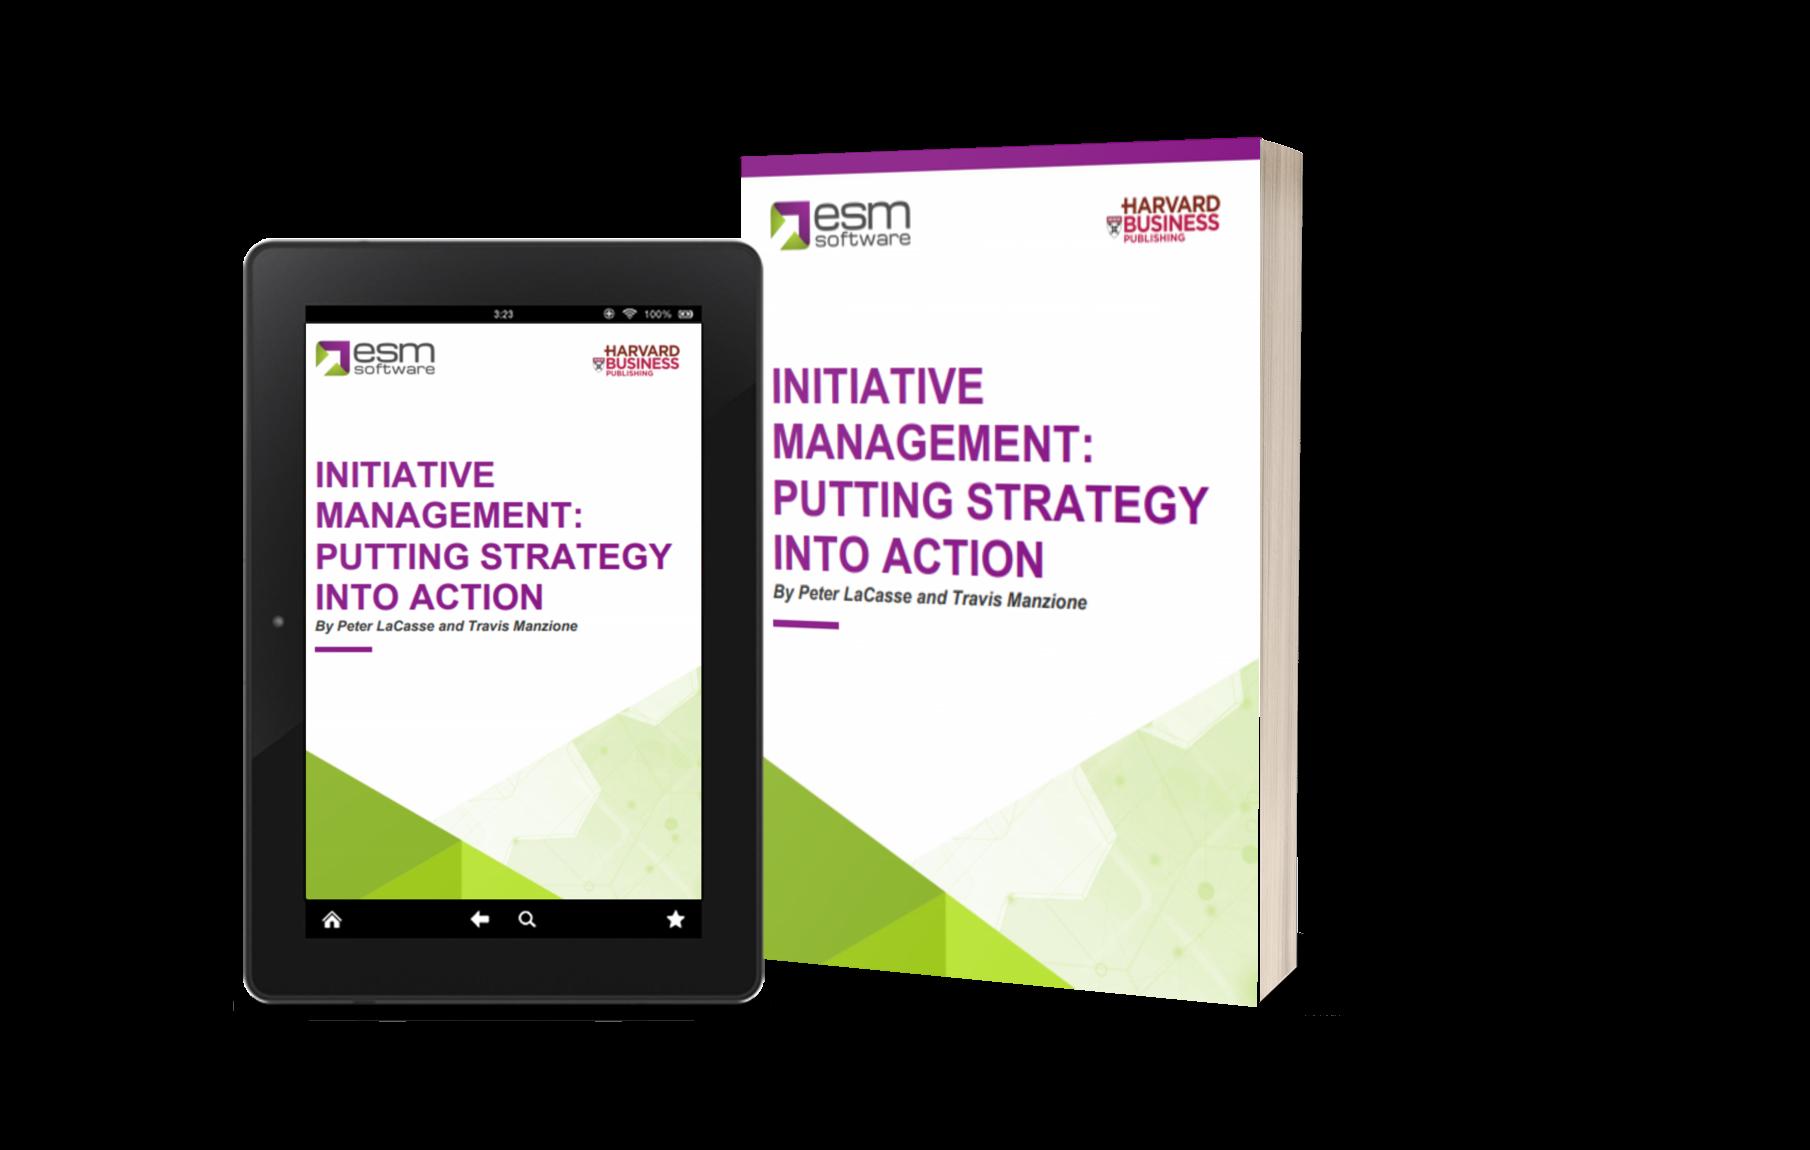 Initiative Management cta white paper-1